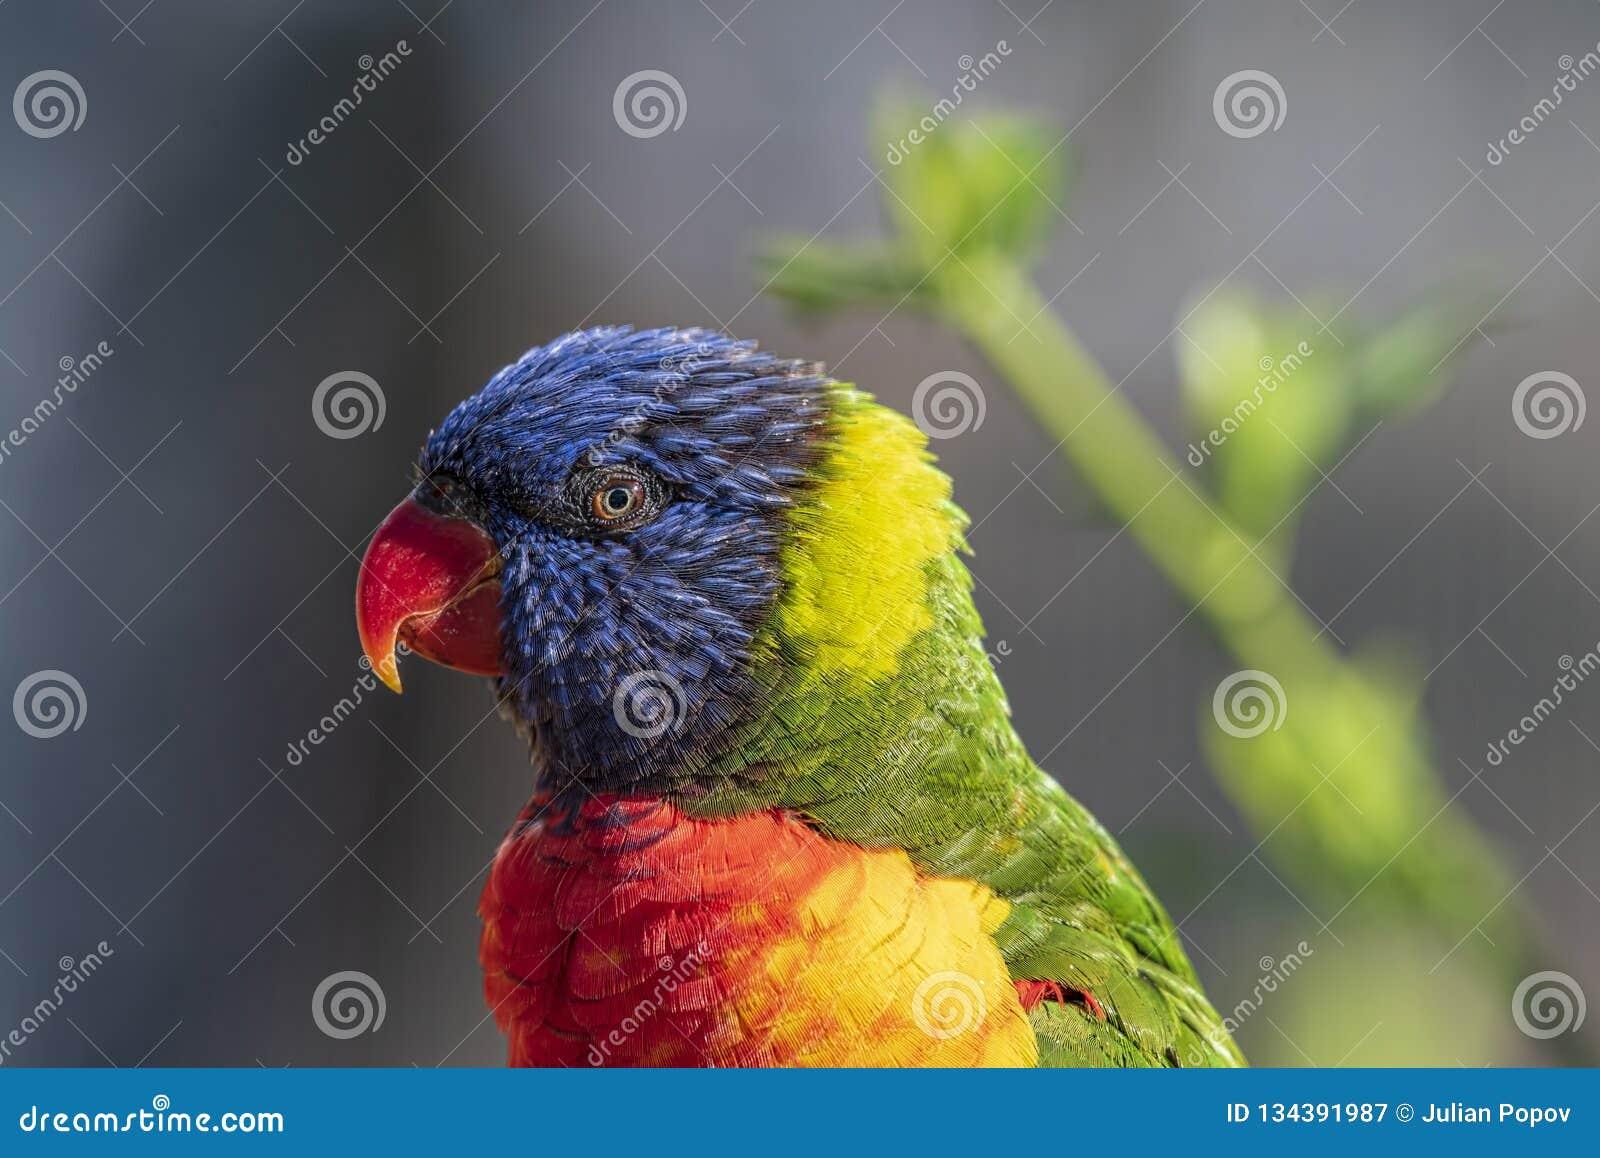 Close Up Of Multicolored Rainbow Lorikeet Parrot